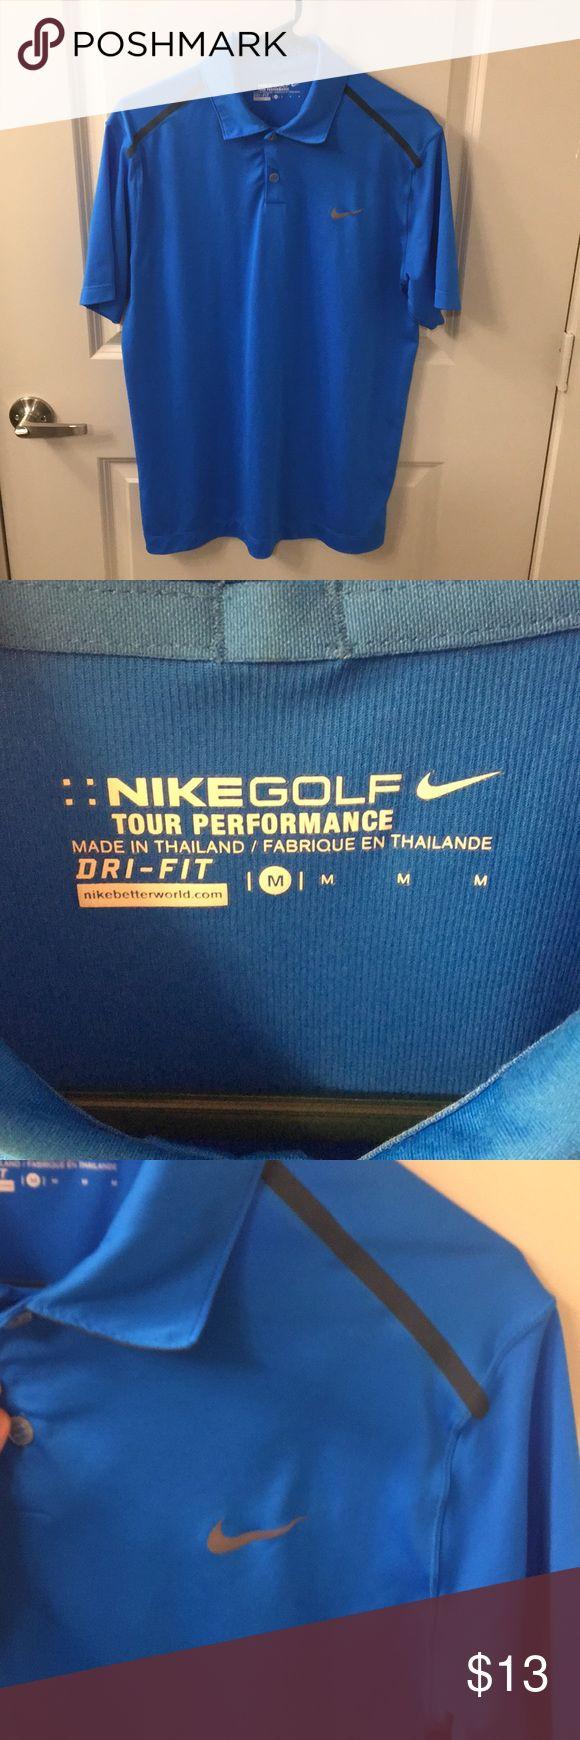 Nike men's golf shirt Very lightweight, bright blue golf shirt.  Northwood Club of Dallas logo on the right sleeve. Nike Shirts Polos